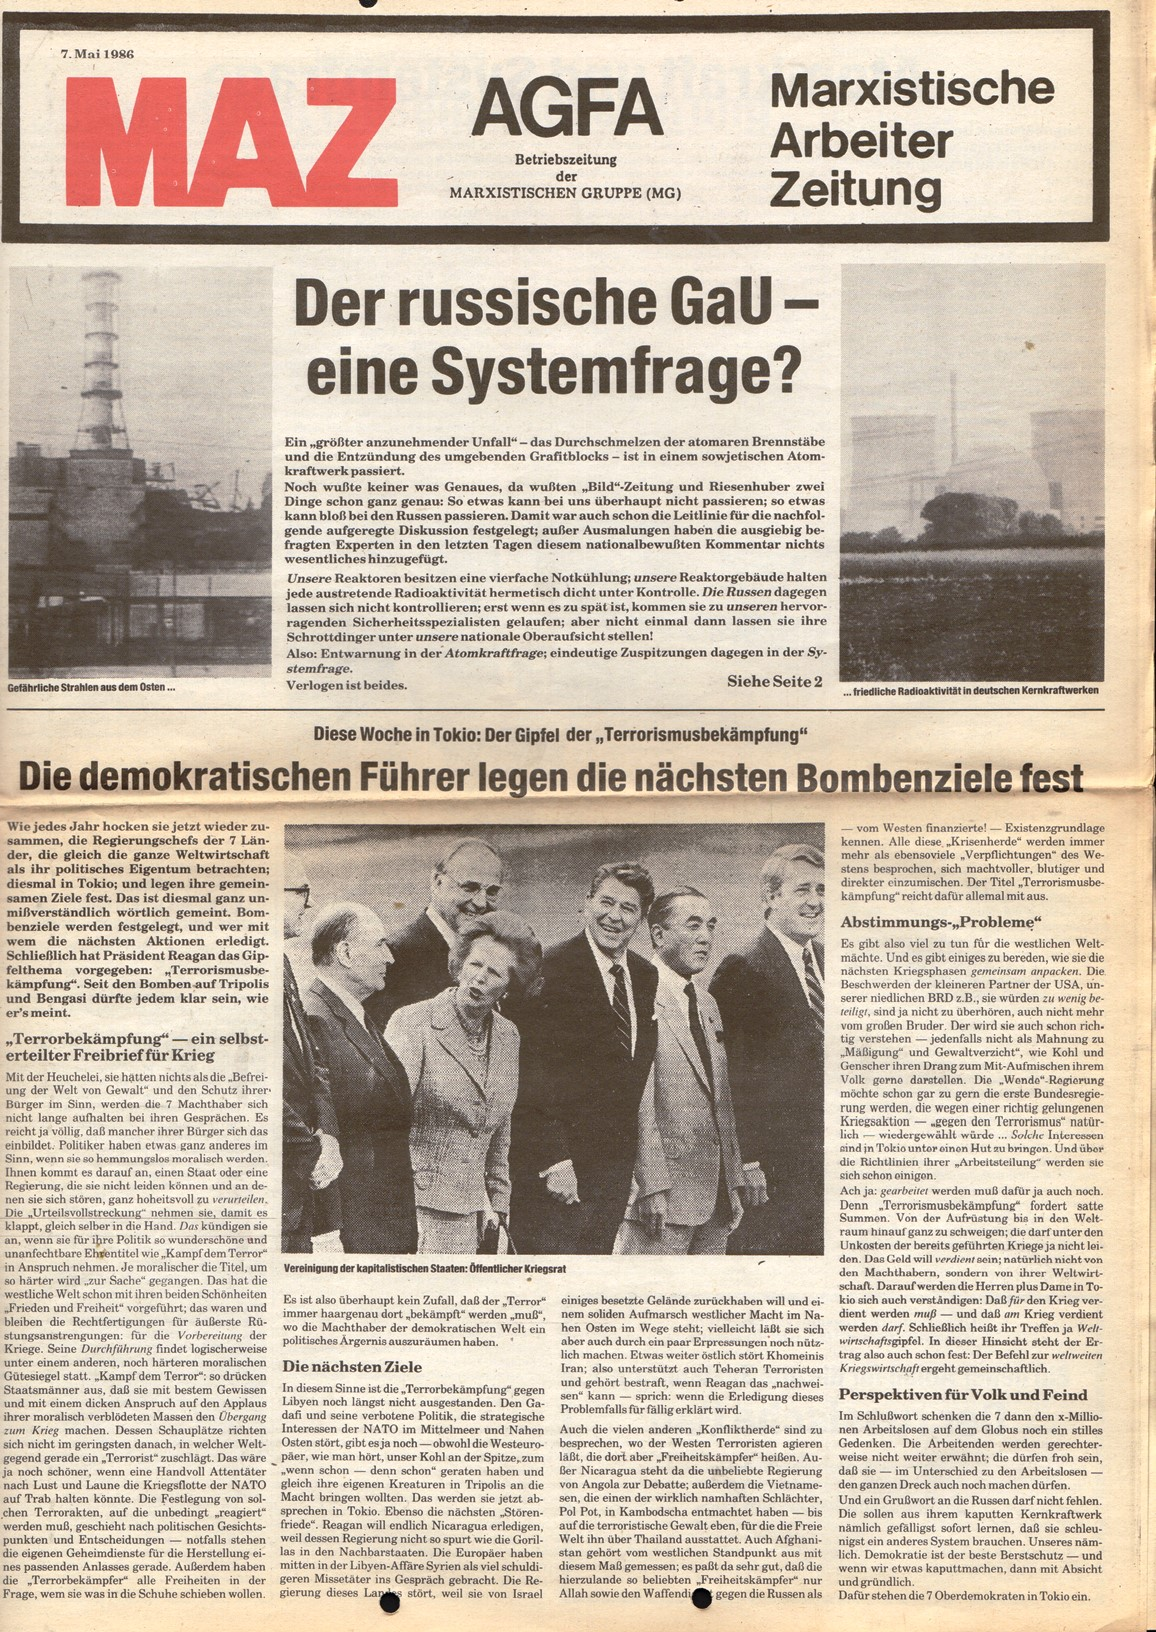 Muenchen_MG_MAZ_AGFA_19860507_01